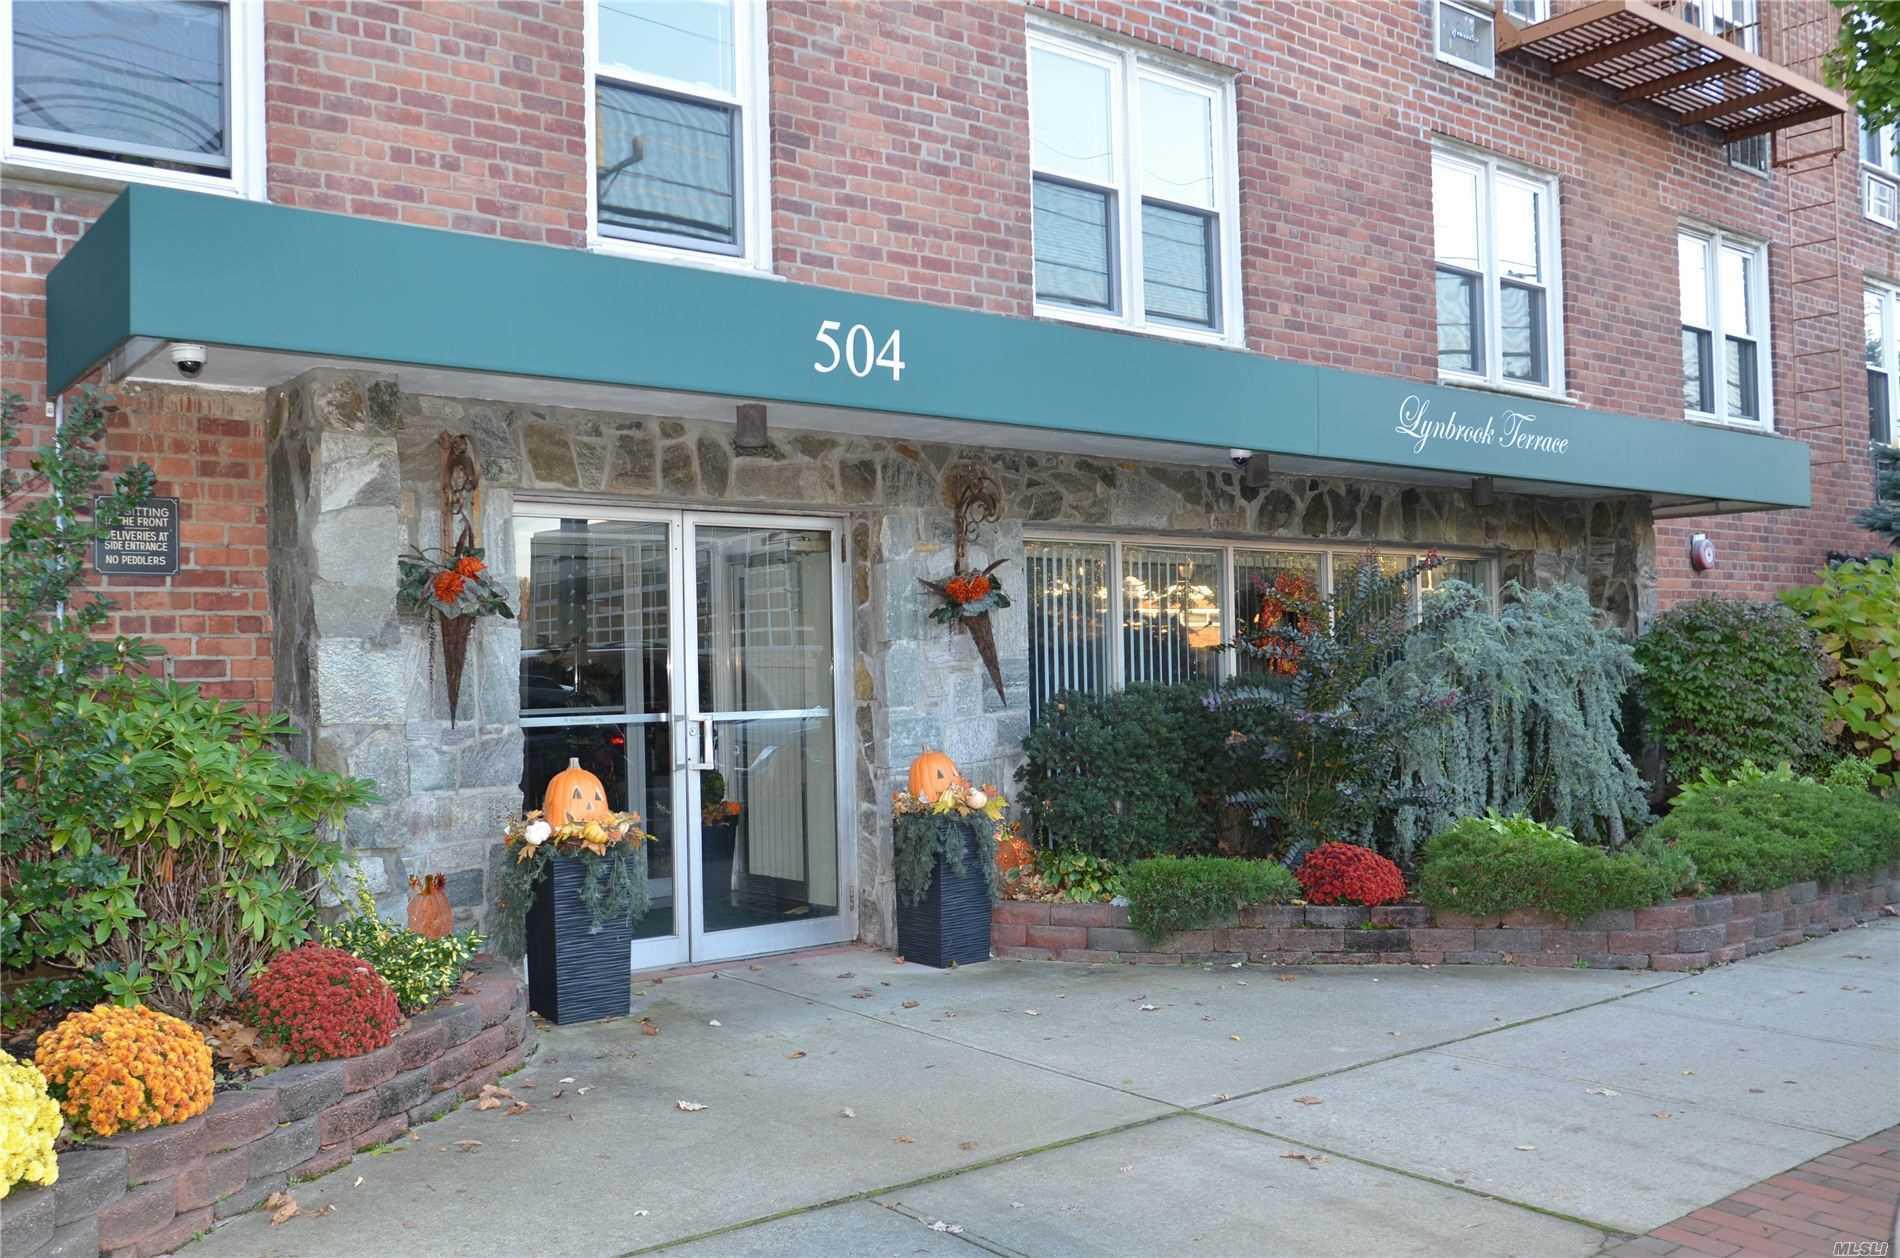 504 Merrick Rd, 3C - Lynbrook, New York